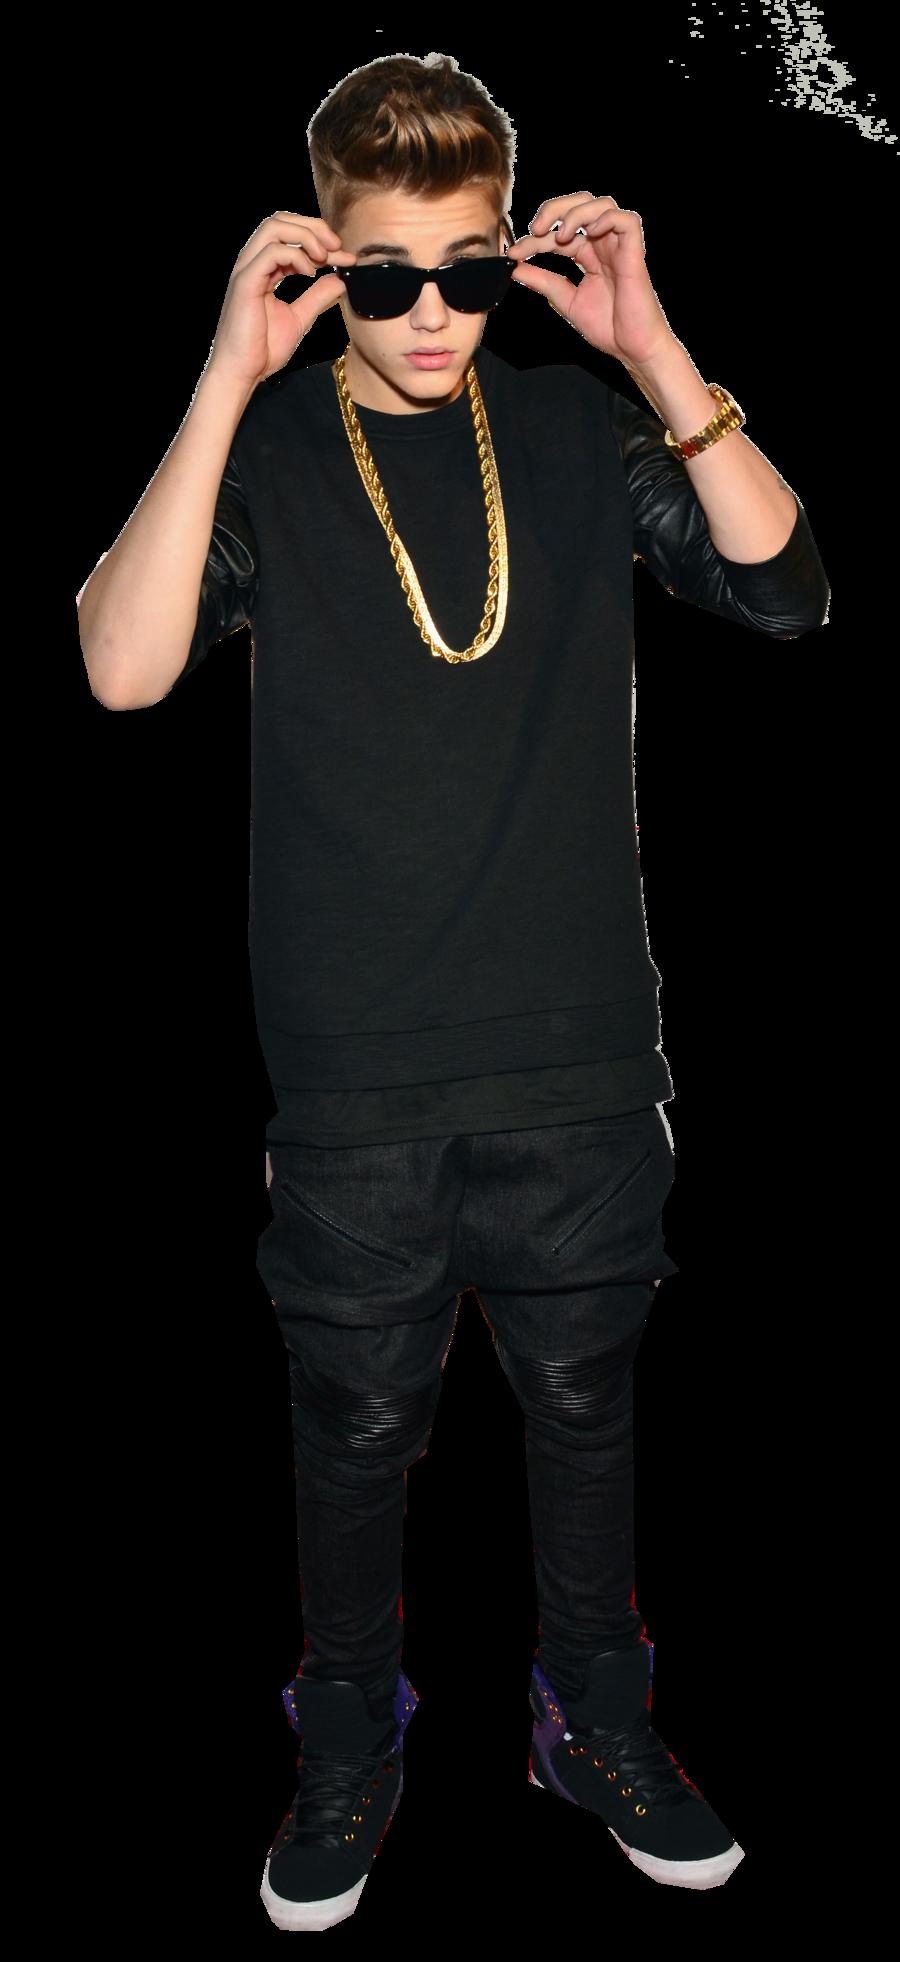 Justin Bieber PNG Clipart-Justin Bieber PNG Clipart-13